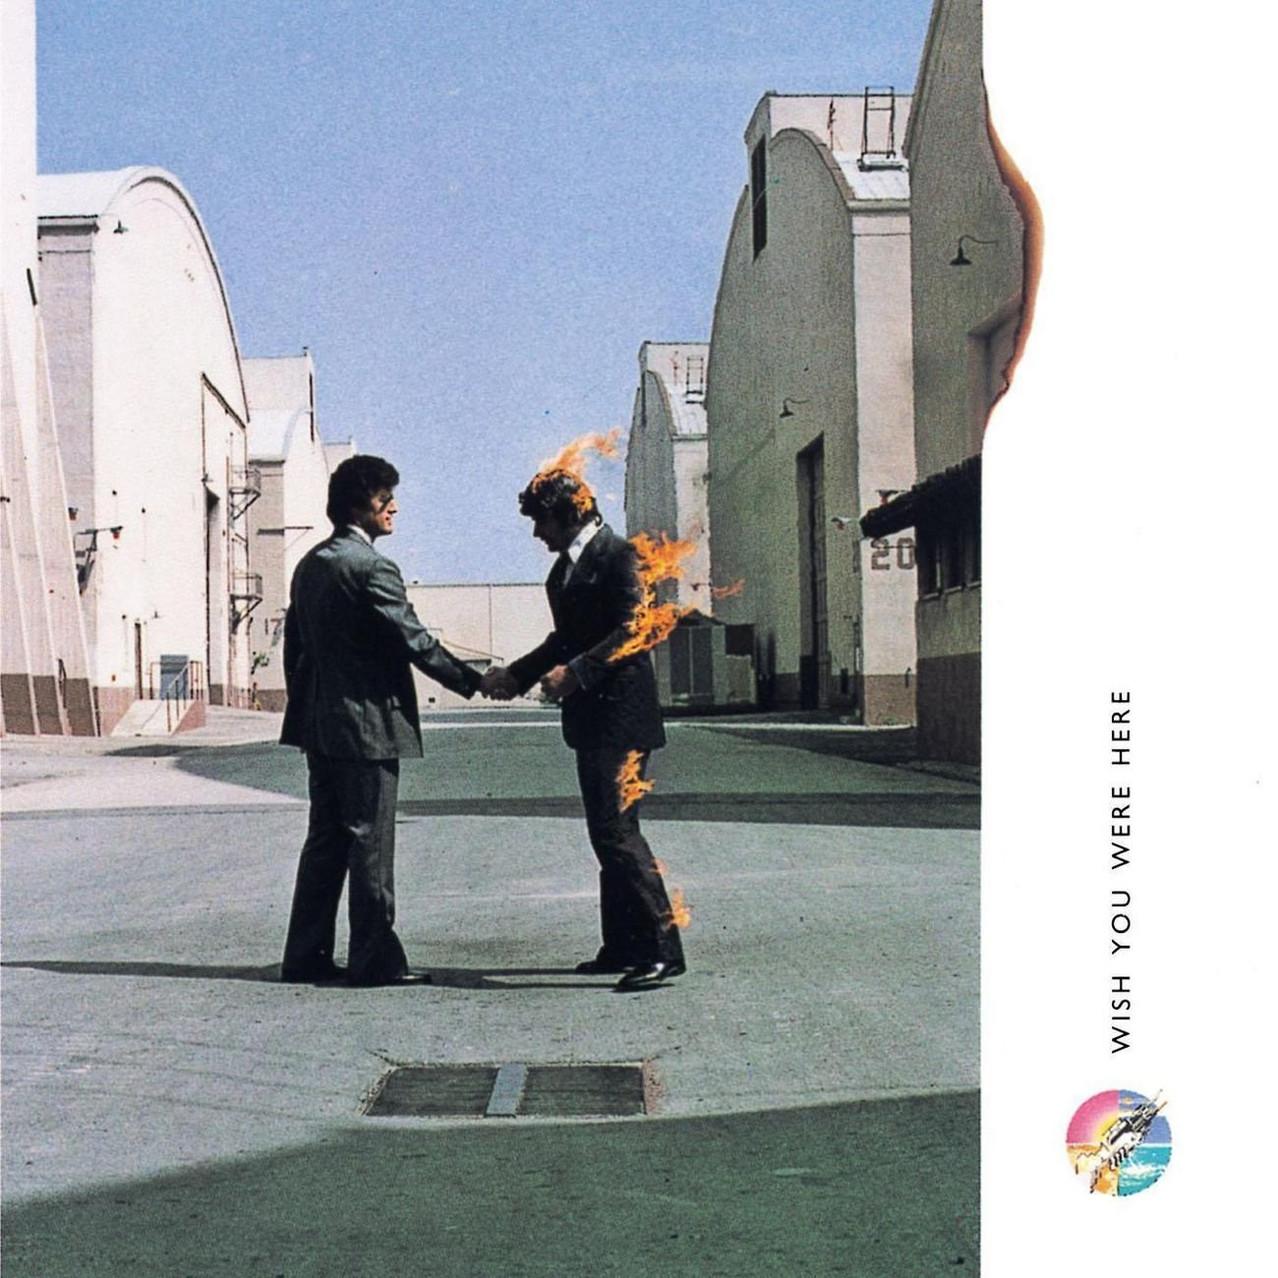 Pink Floyd x Wish You Were Here